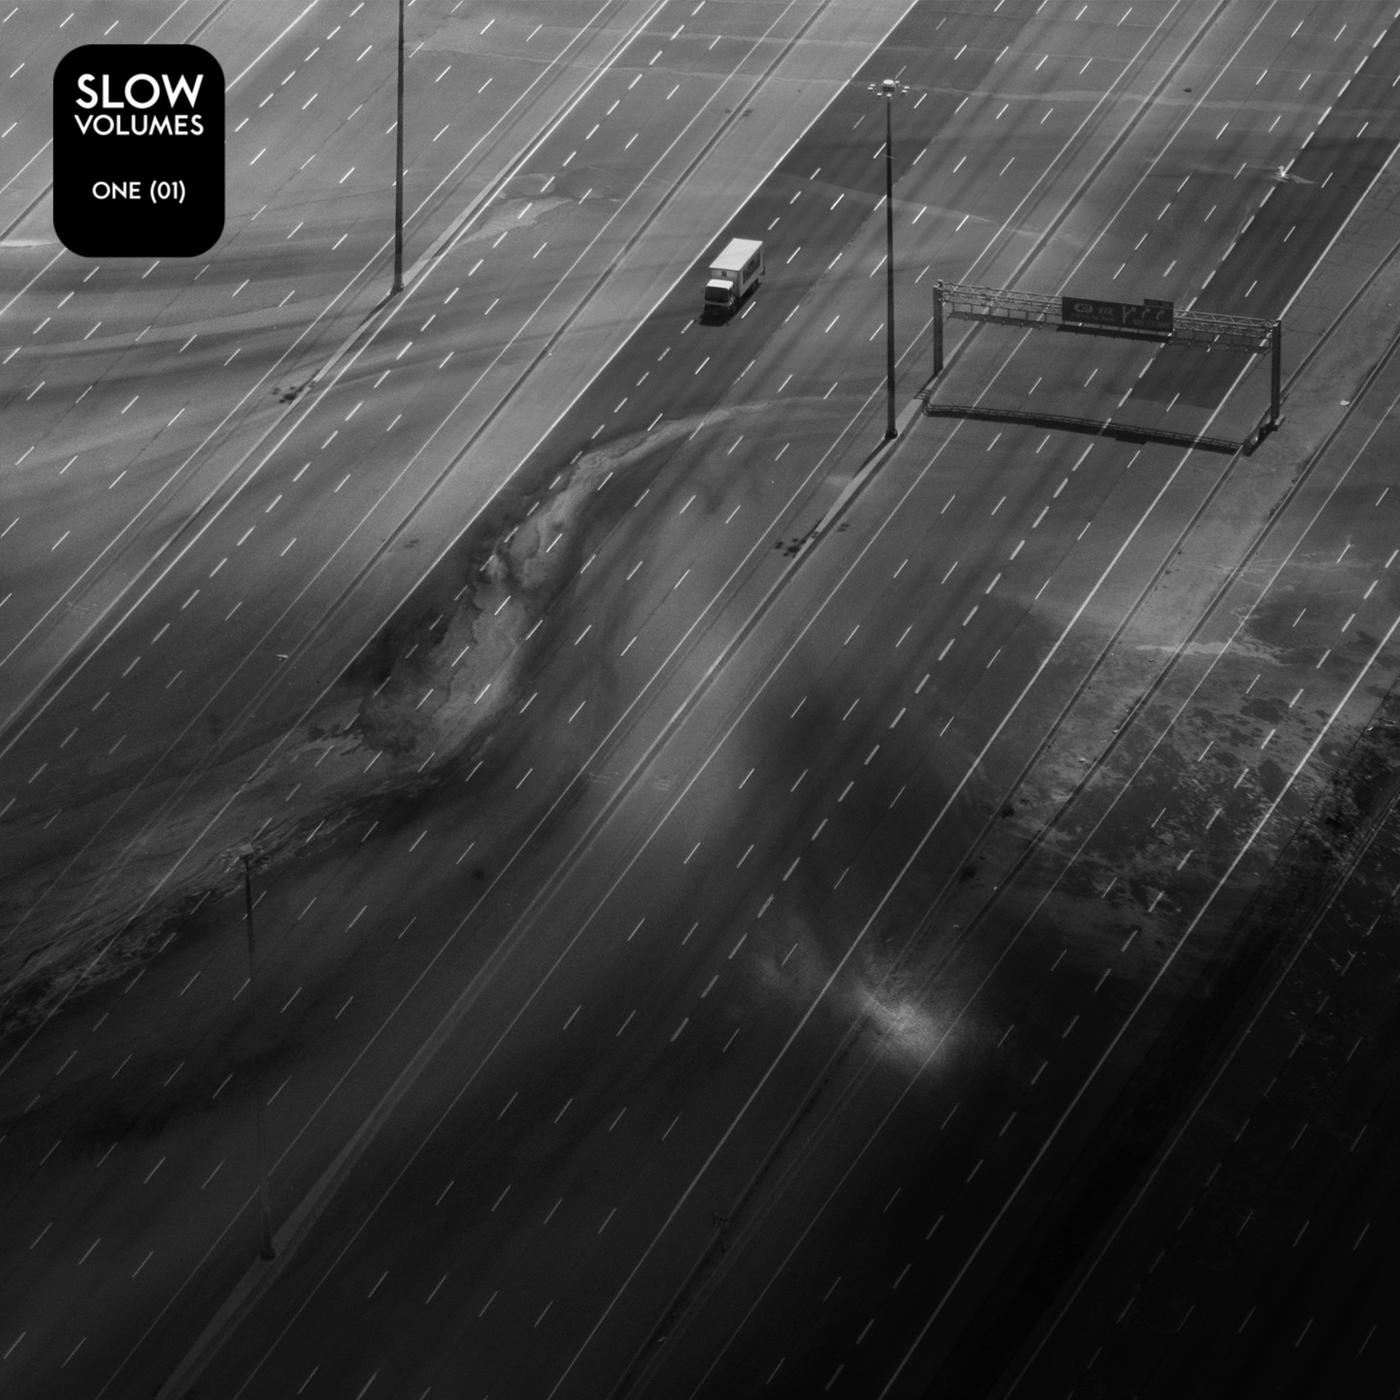 slow down -